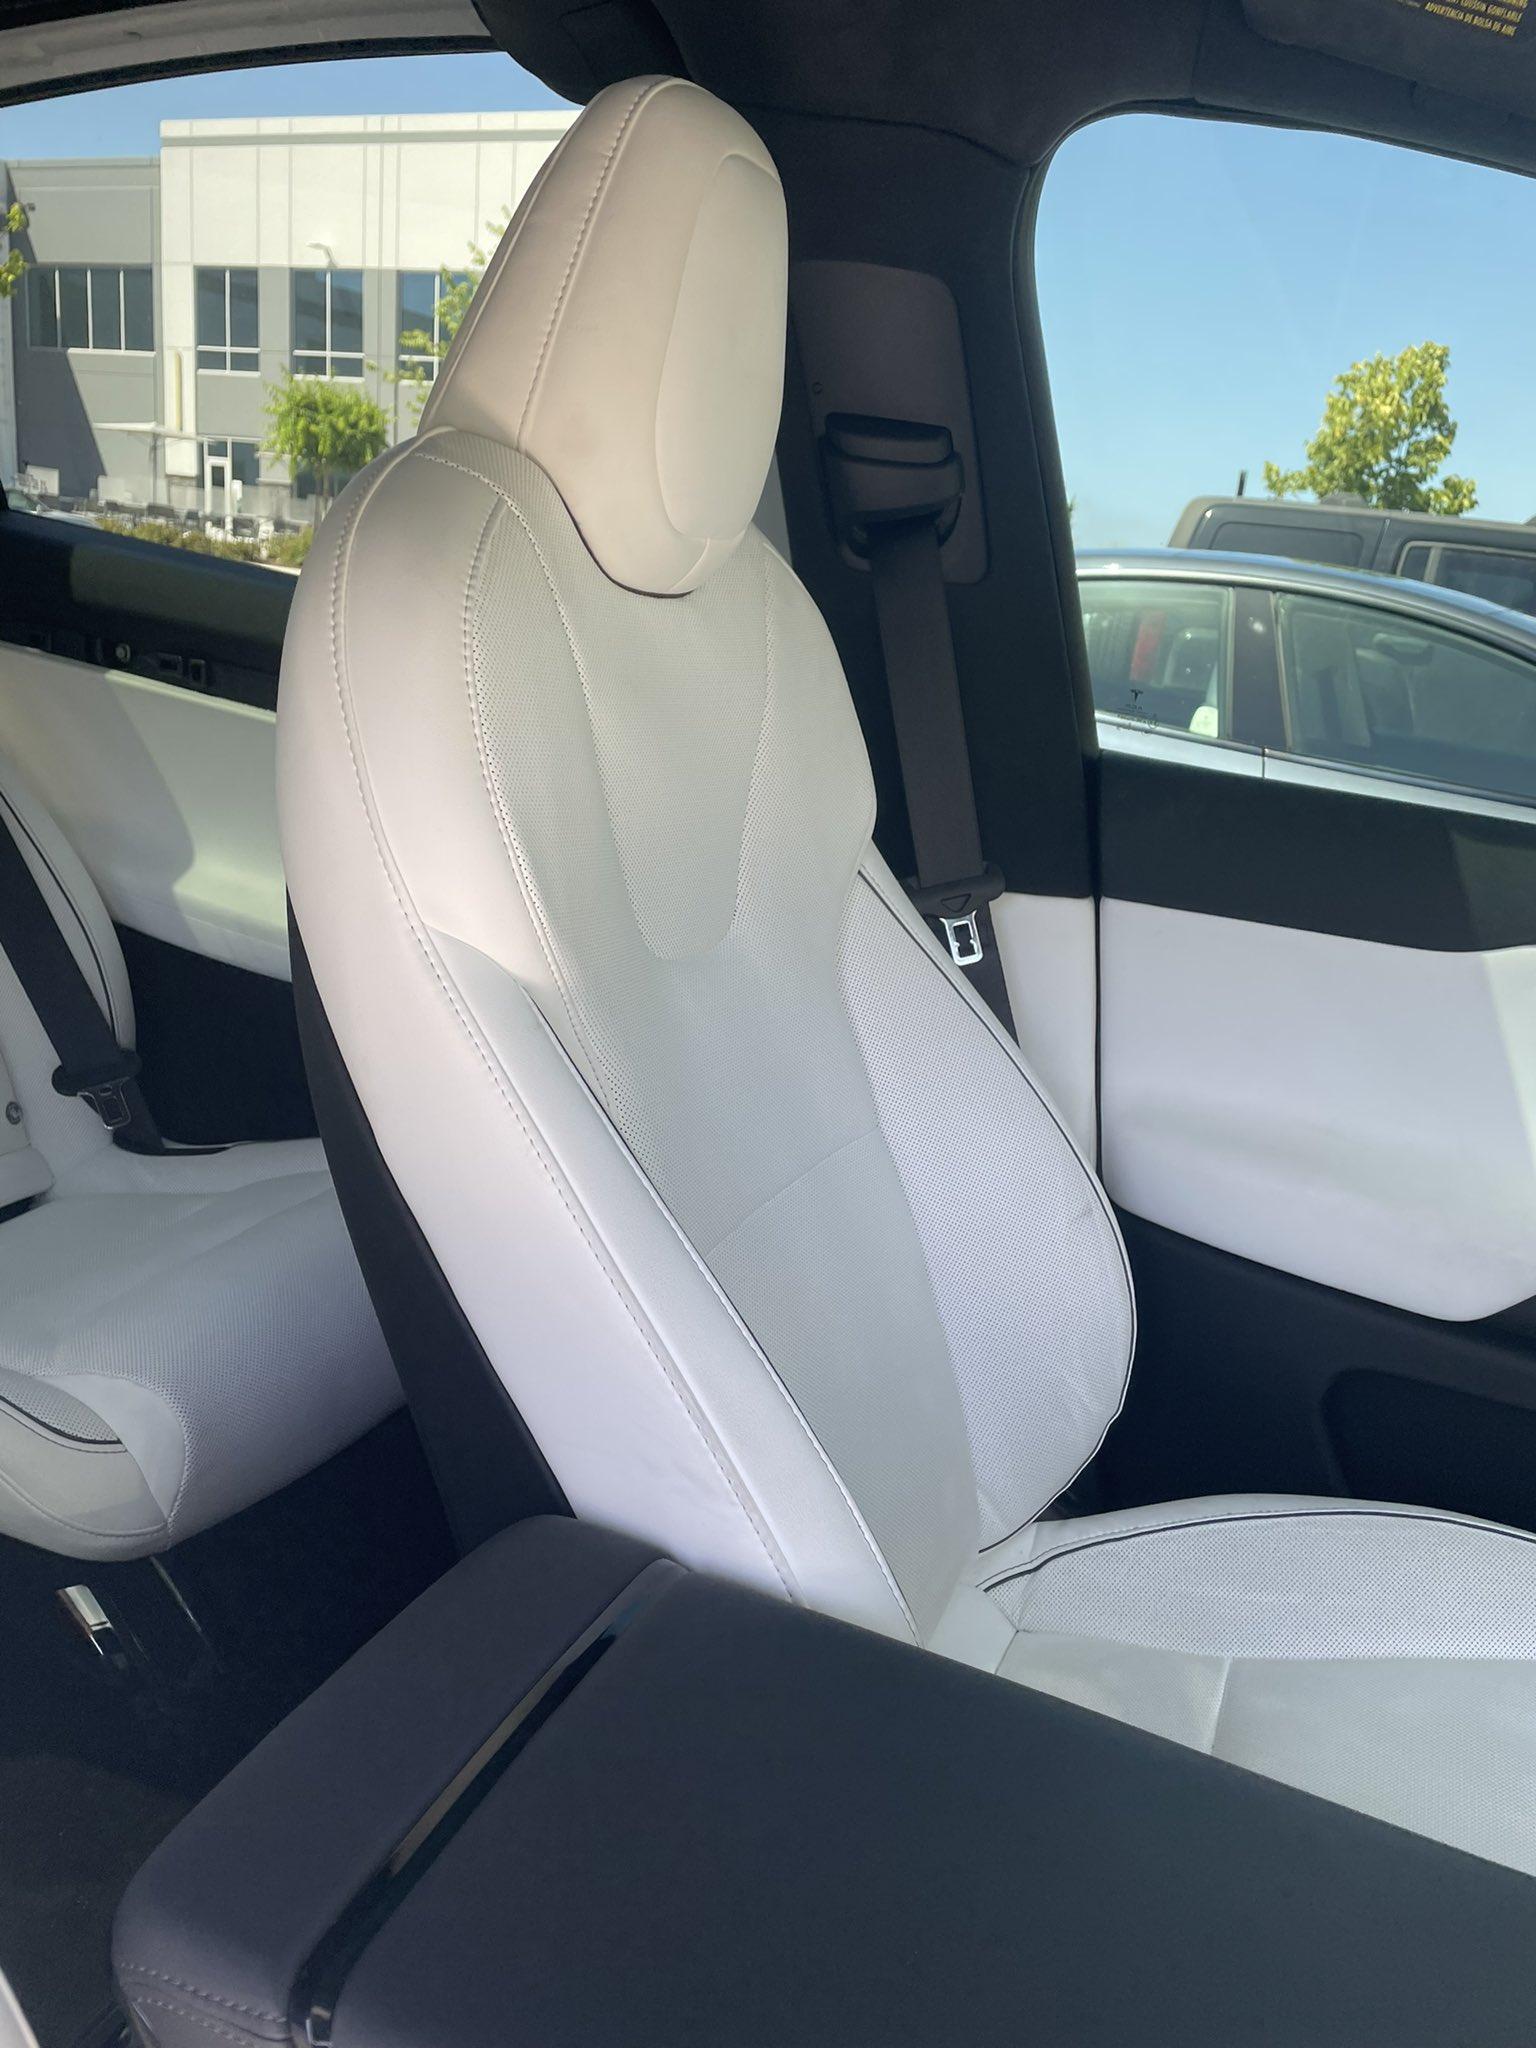 model-x-plaid-front-seat